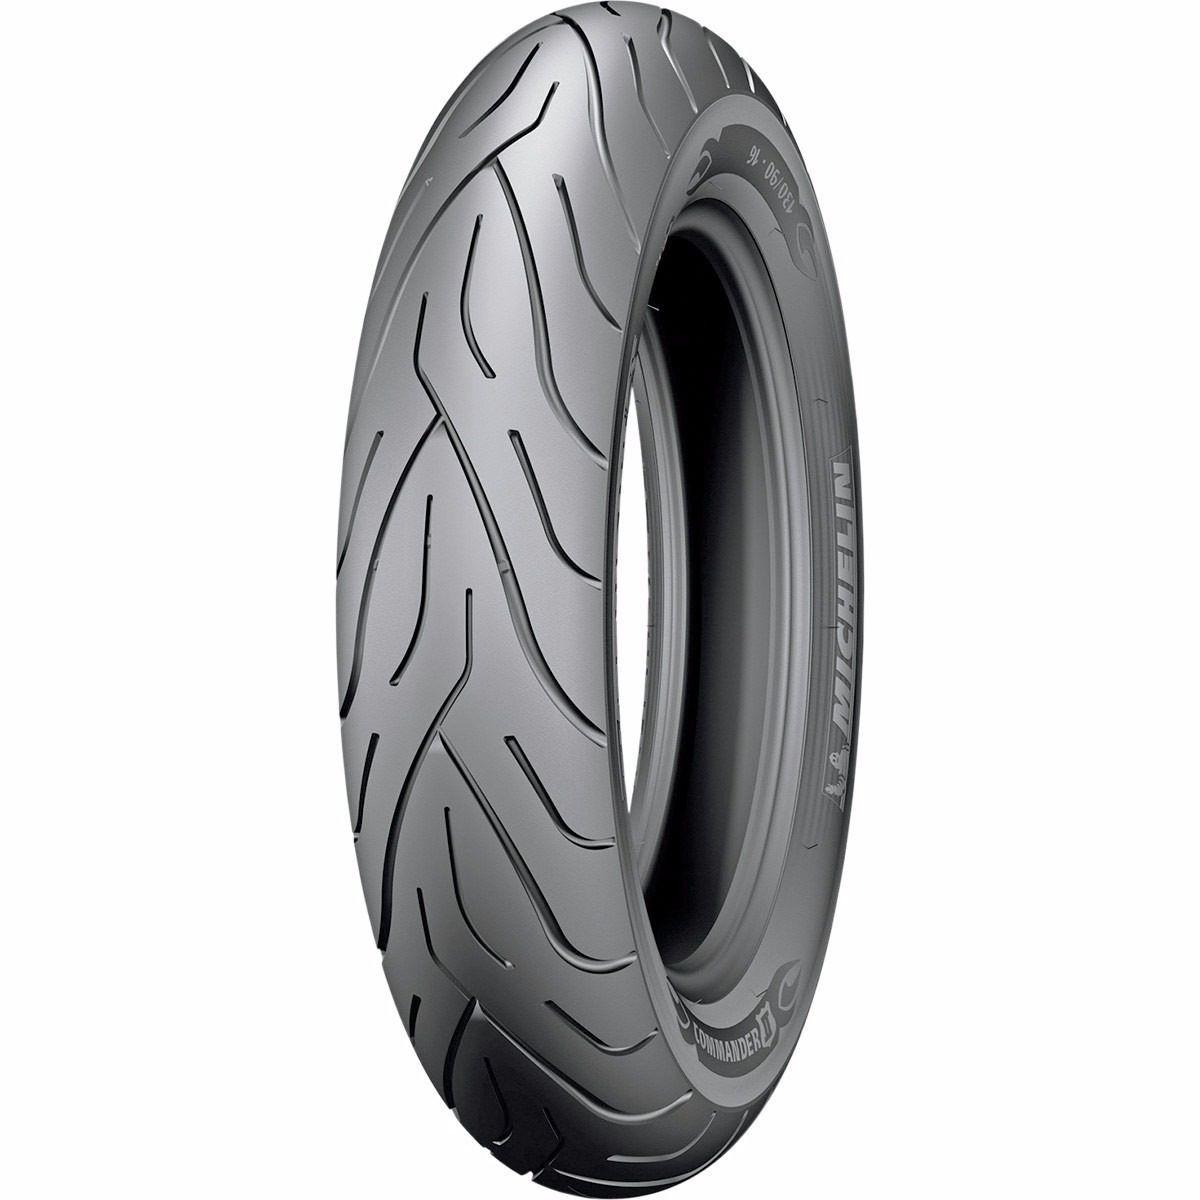 Pneu Diant Michelin 140-75-17 Commander 2 67v 4926